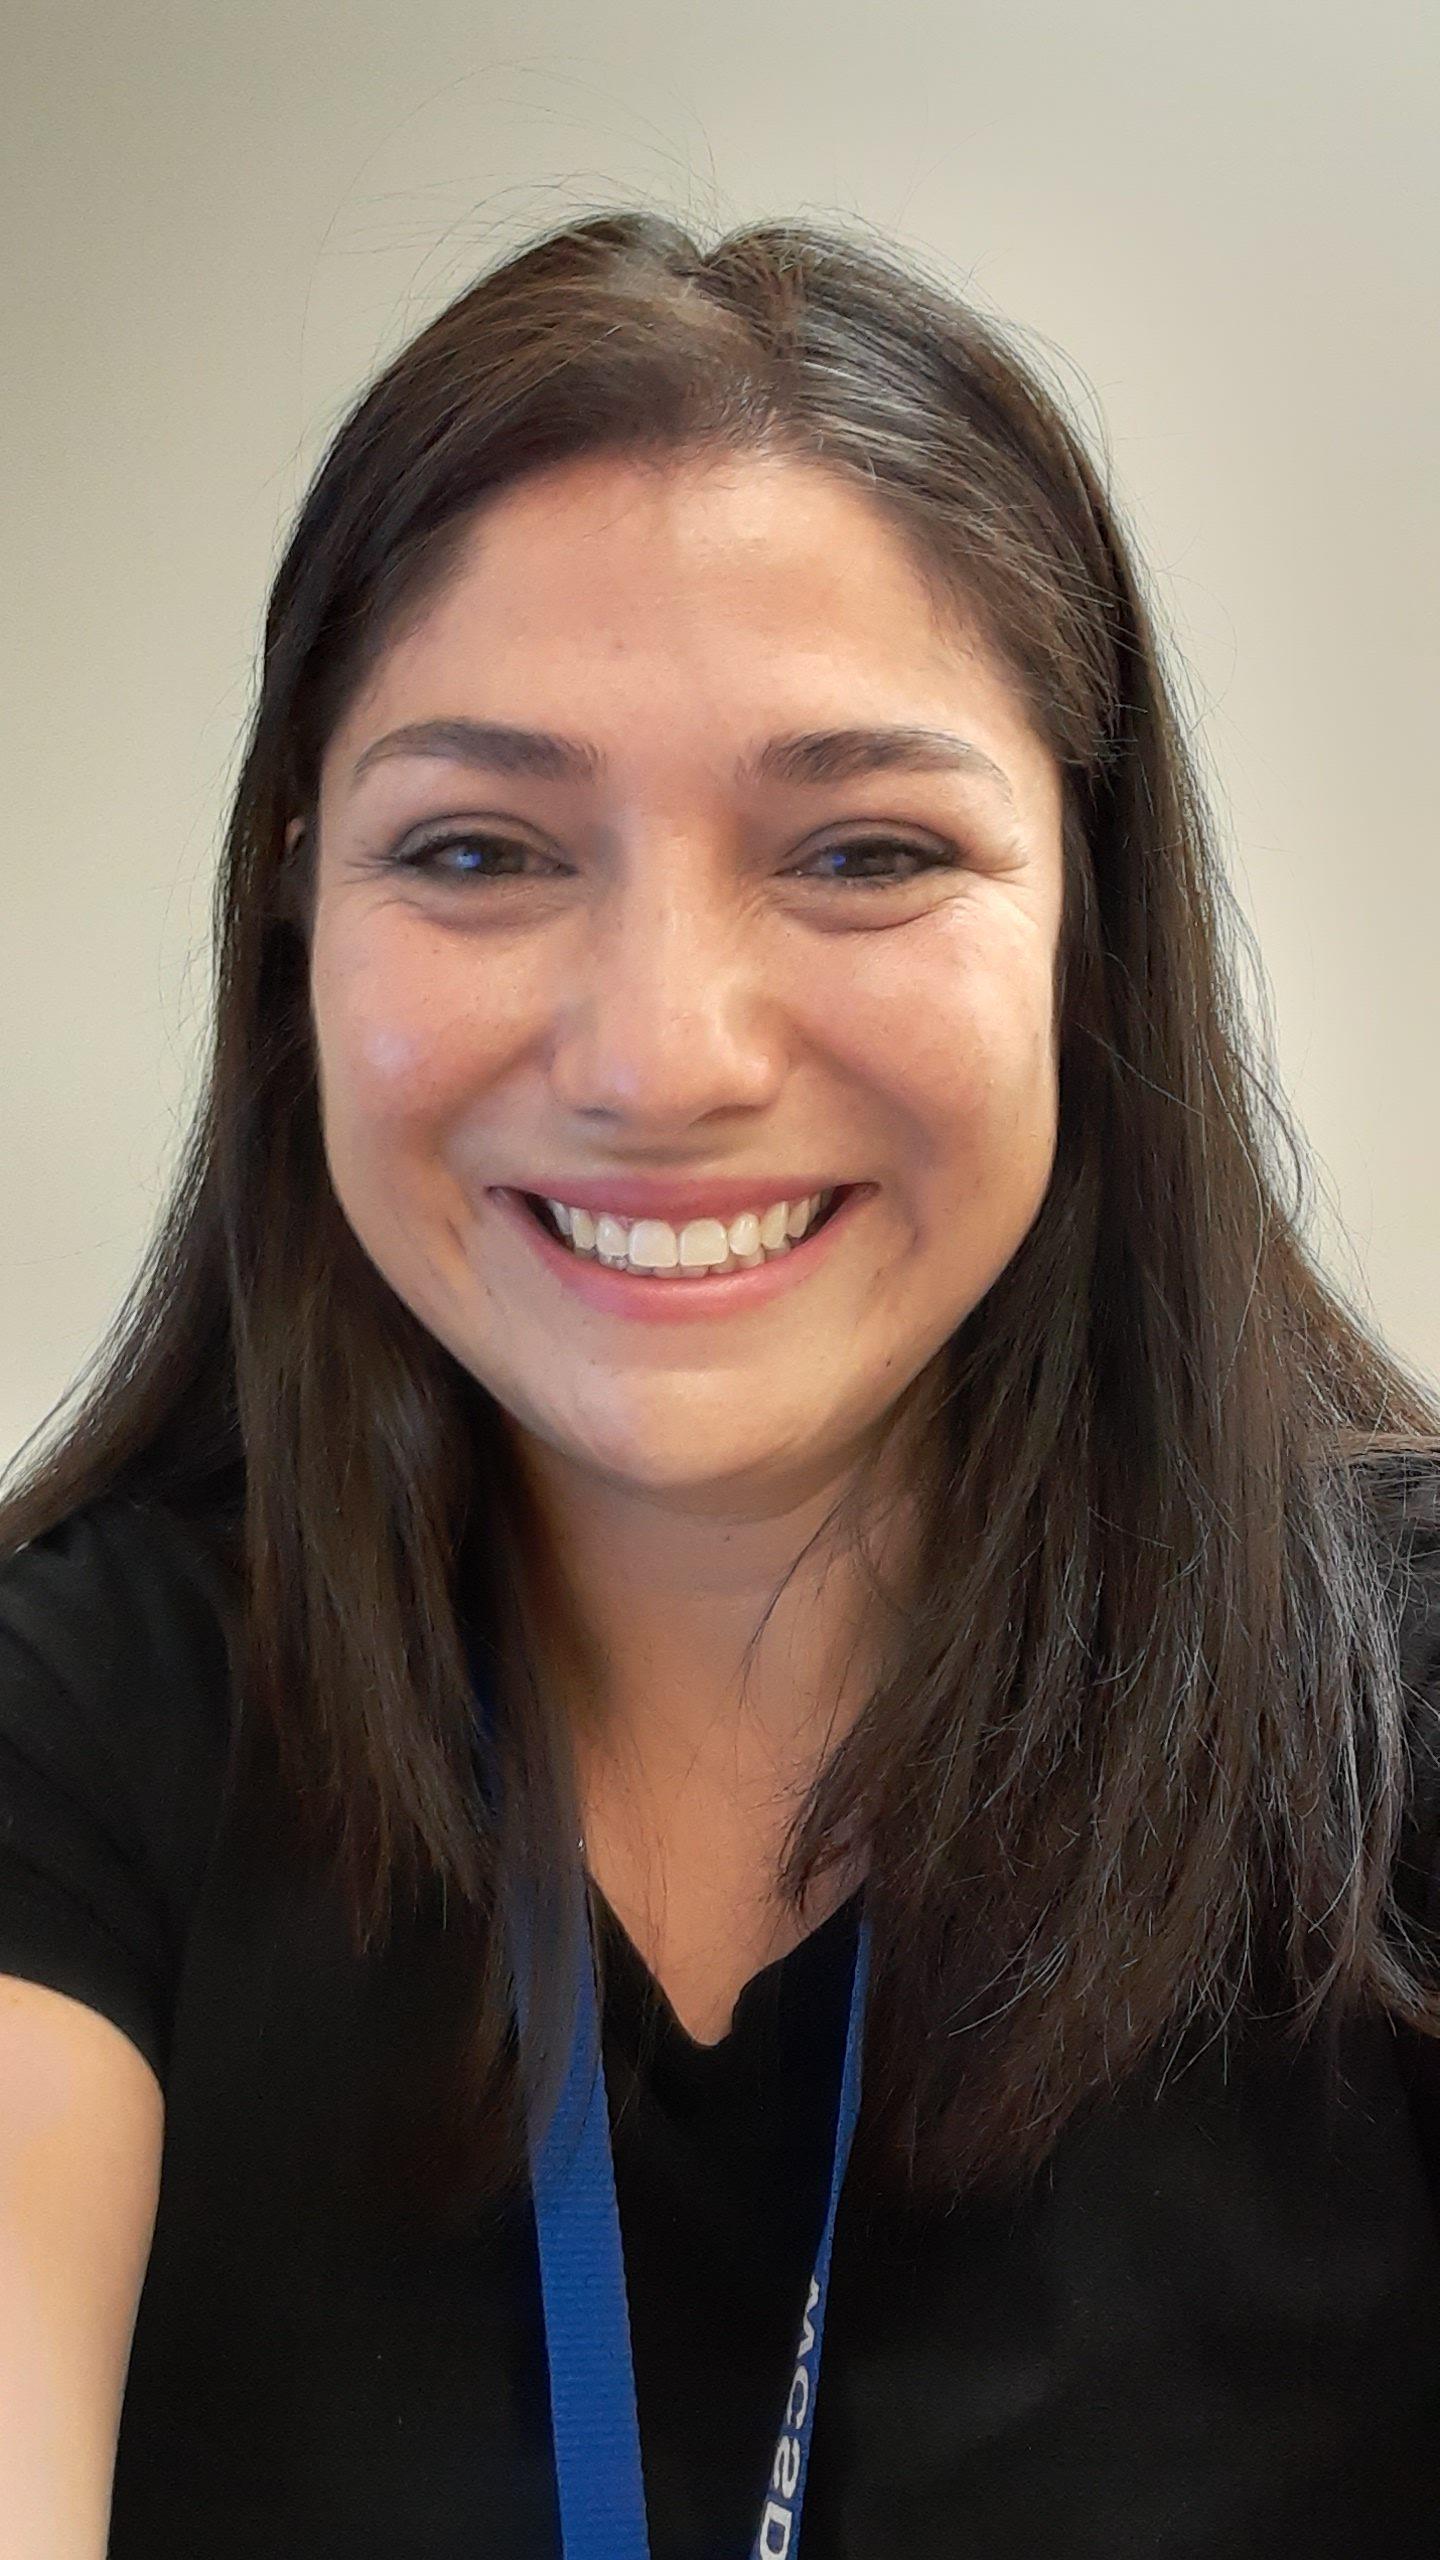 Elissa Jorgensen : Attendance Secretary